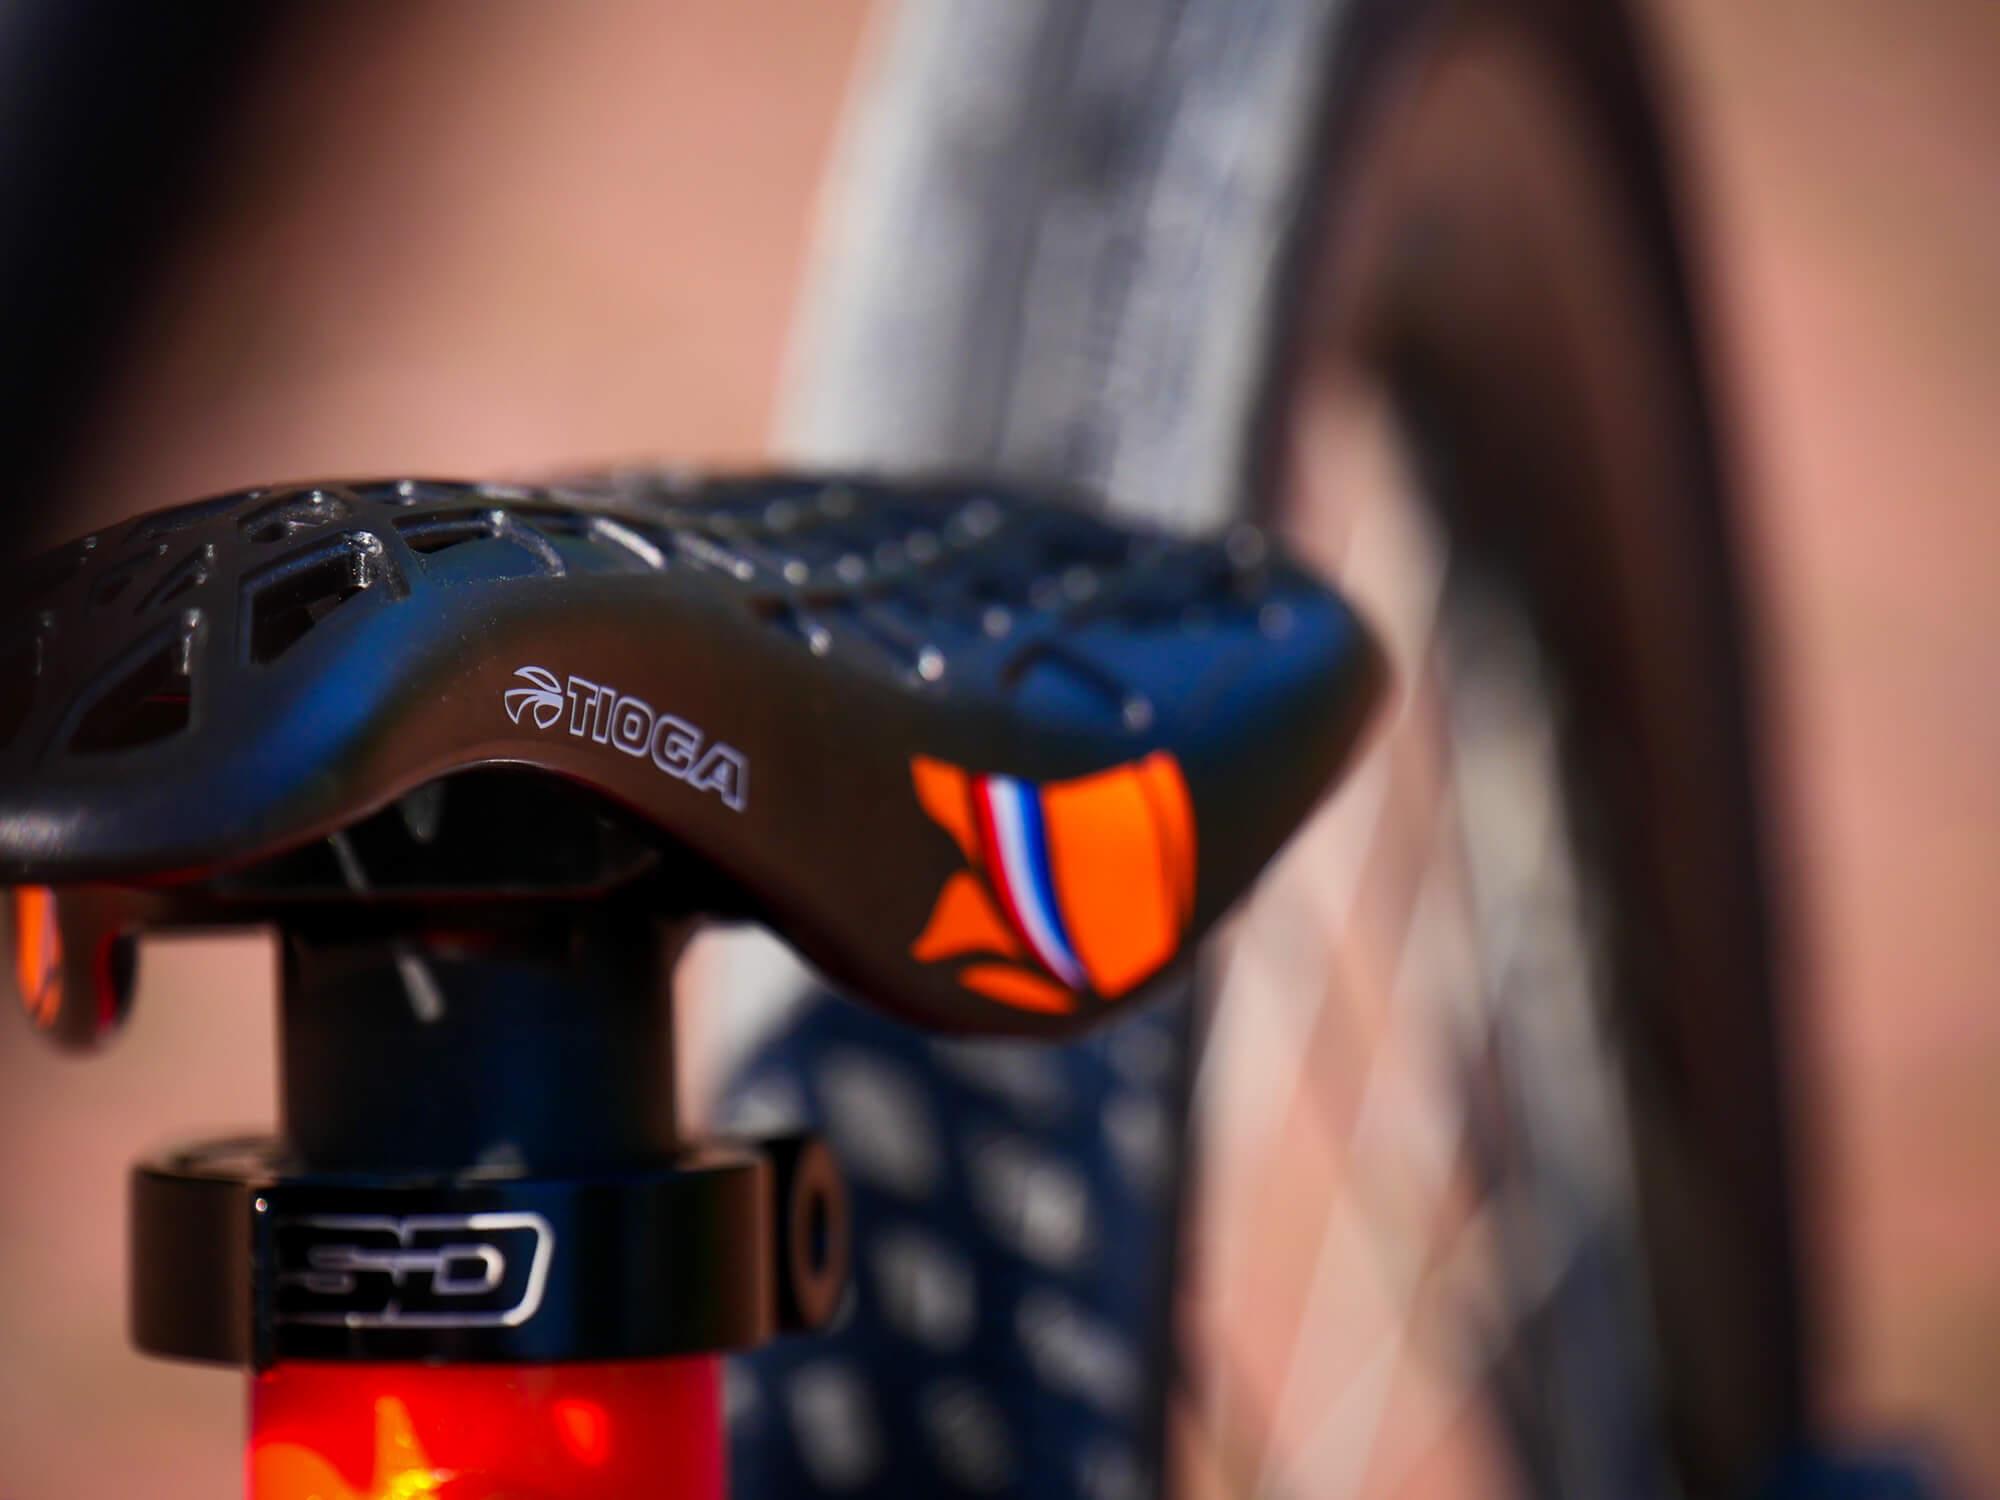 Laura Smulder Tokyo 2020 Olympics Bike Check